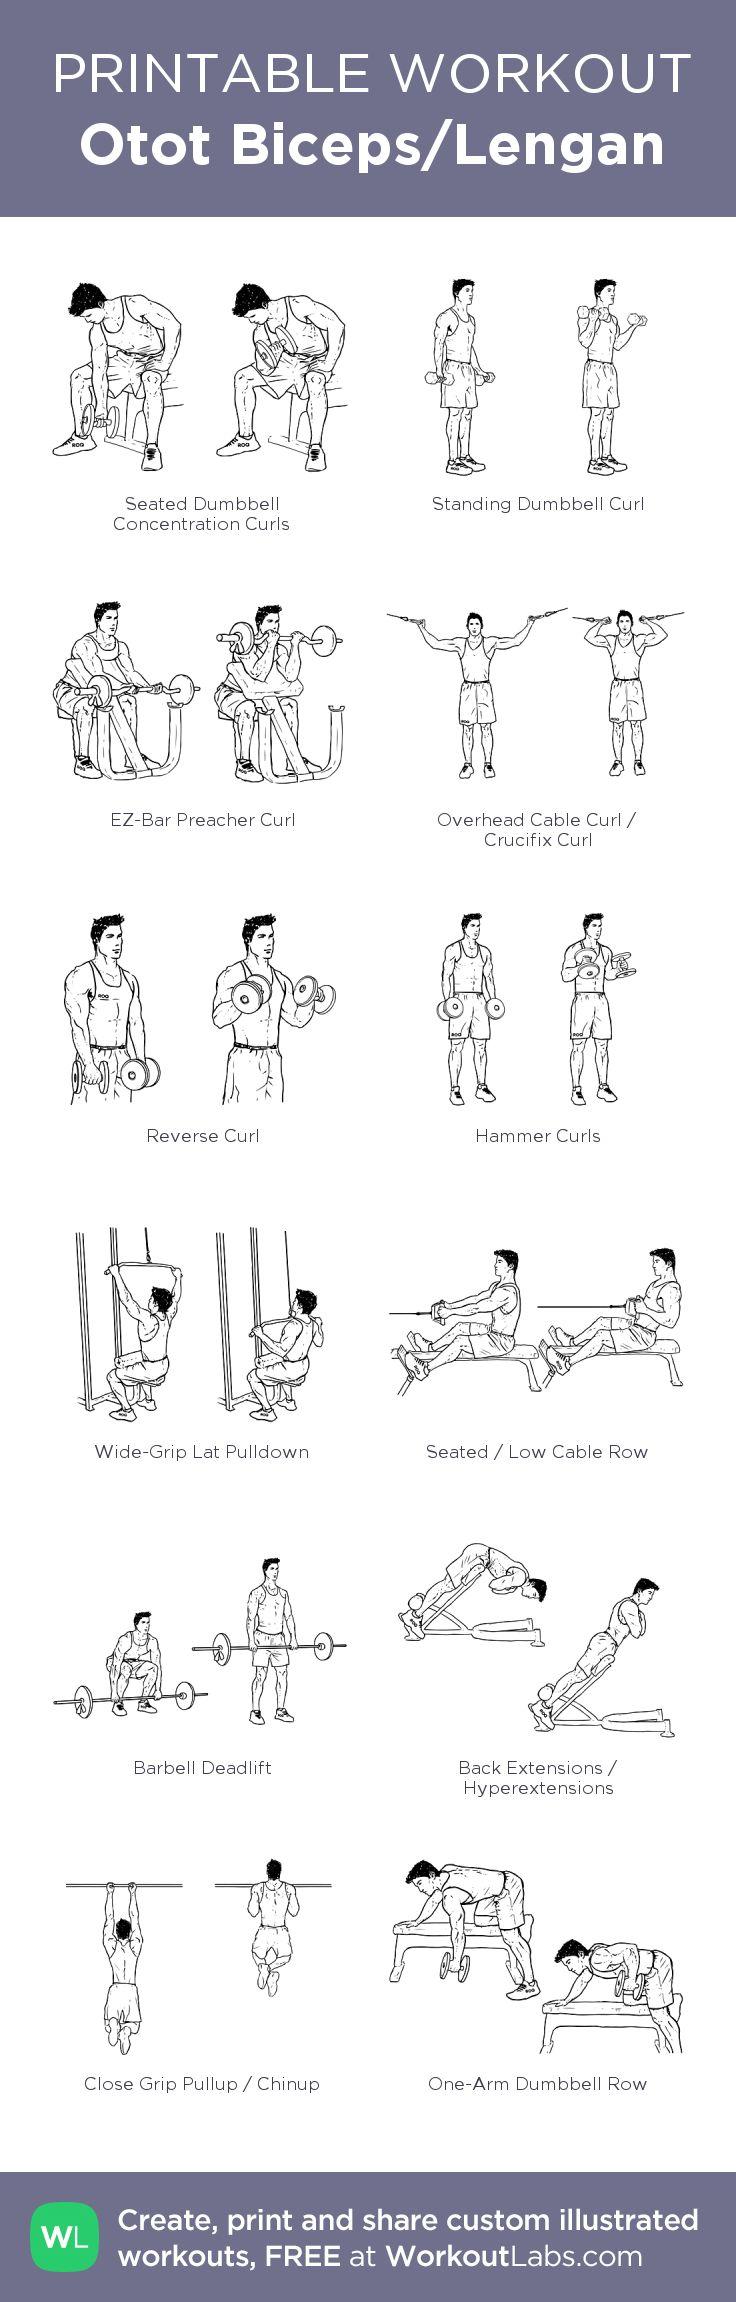 Otot Biceps/Lengan –my custom workout created at WorkoutLabs.com • Click through to download as printable PDF! #customworkout